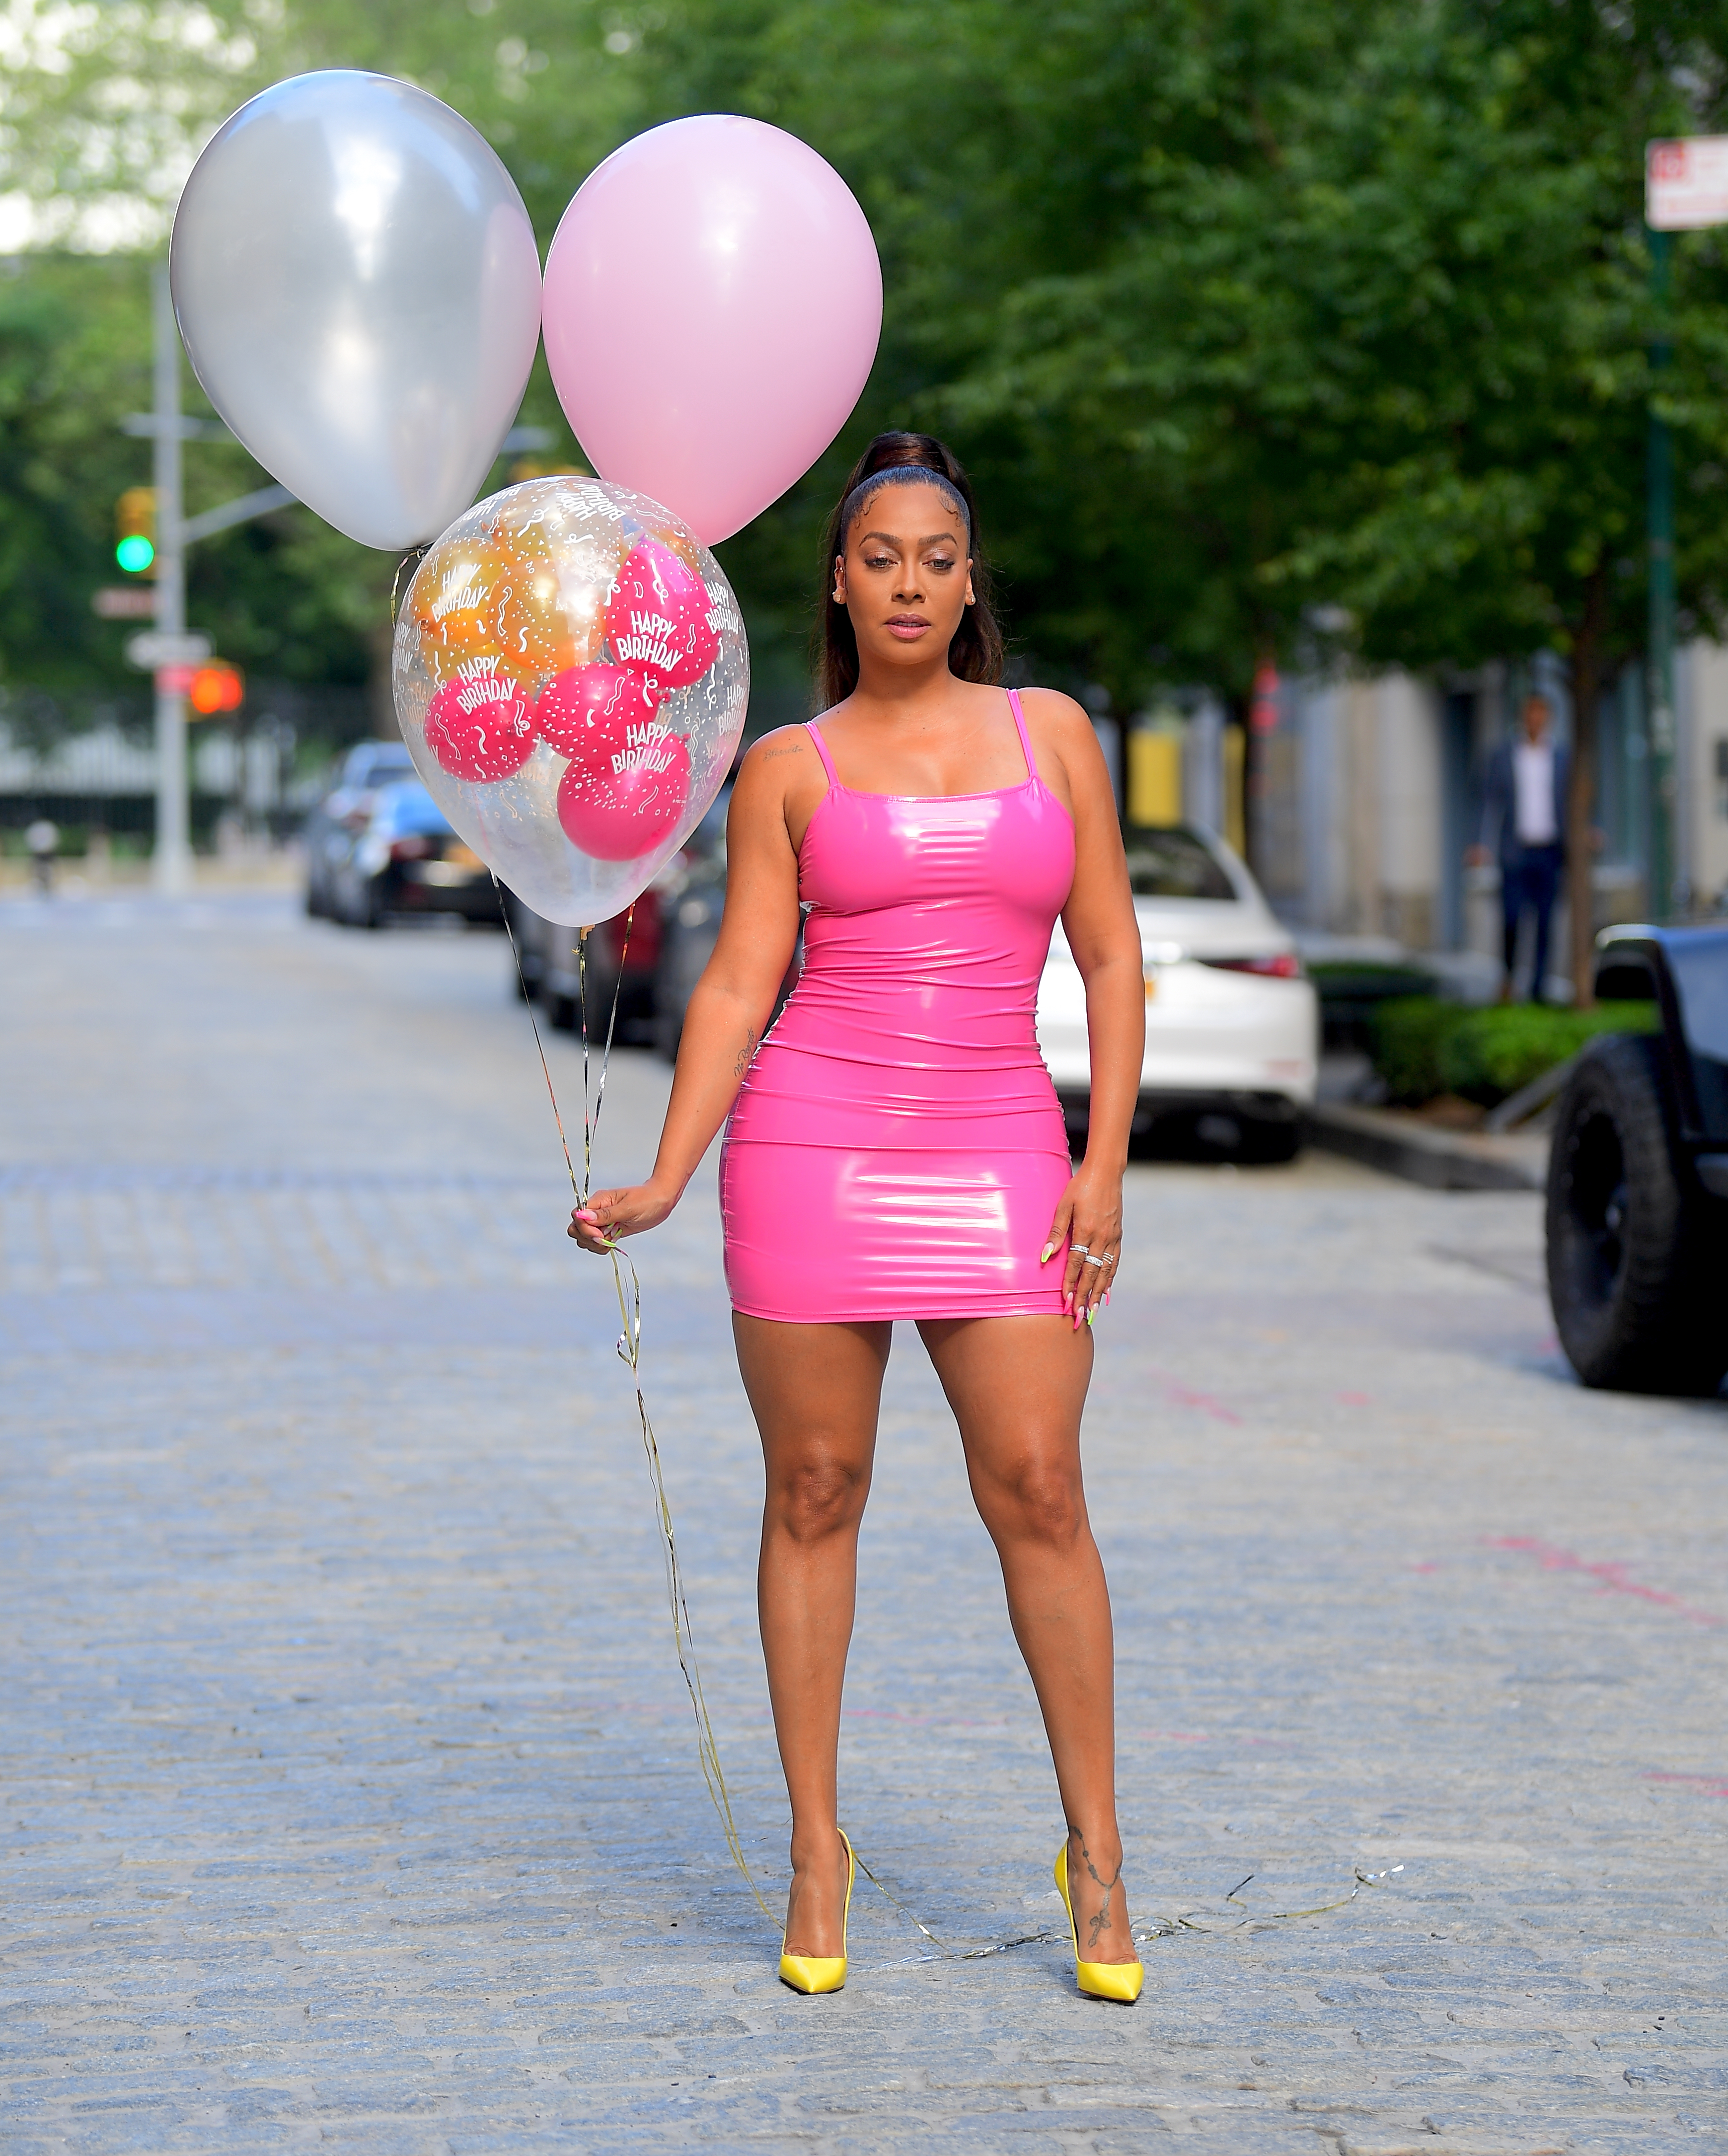 La La Anthony on her birthday